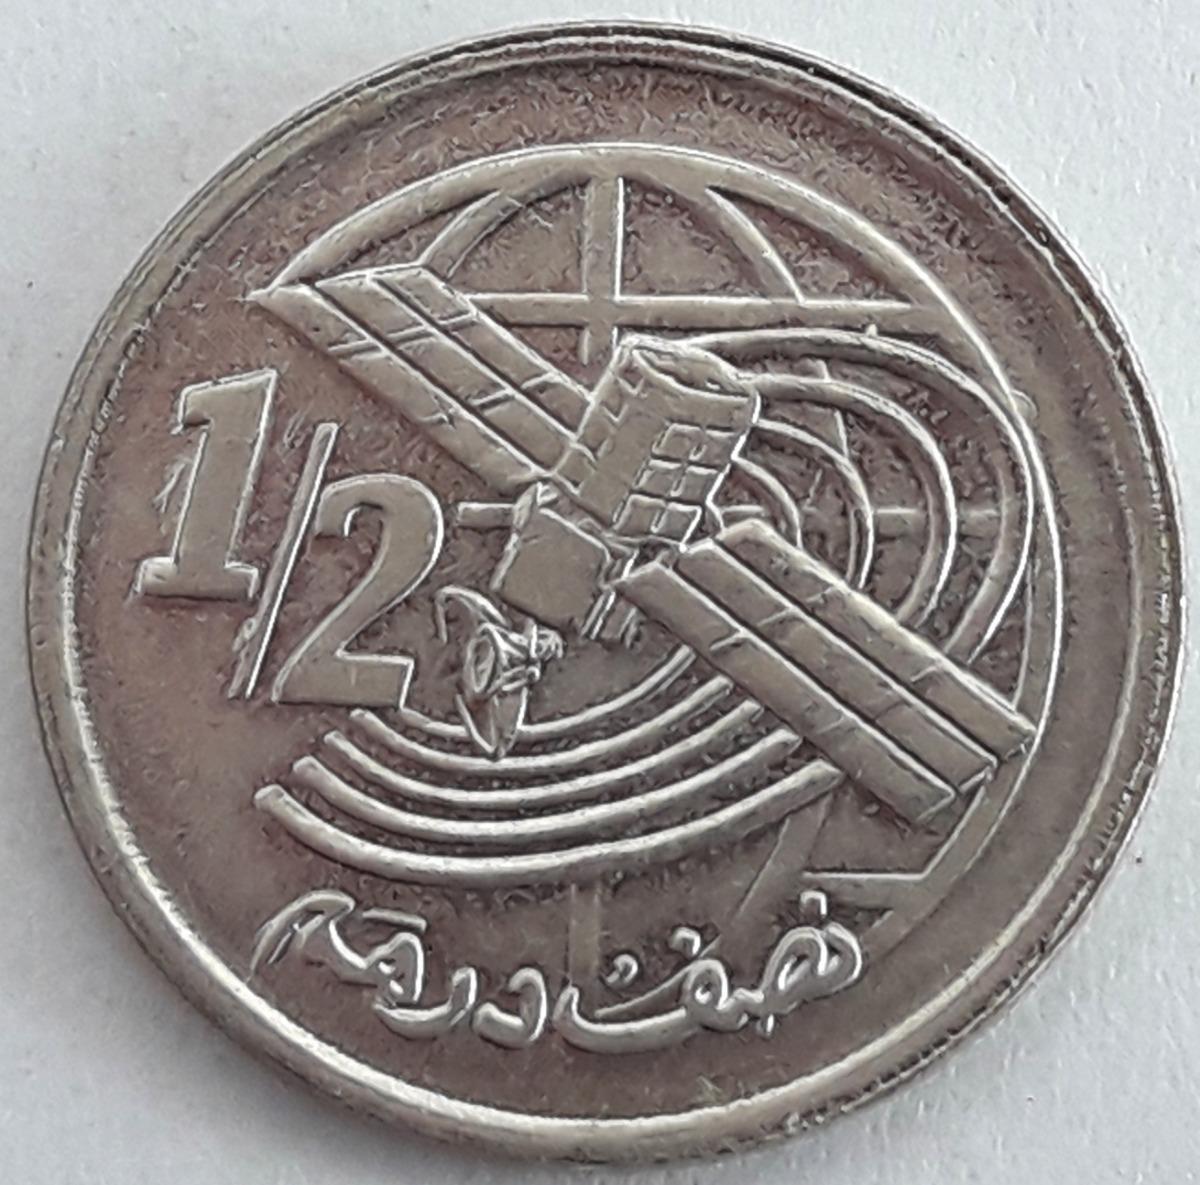 Calendario Islamico.Marruecos 1 2 Dirham Del Ano 2002 1423 Calendario Islamico